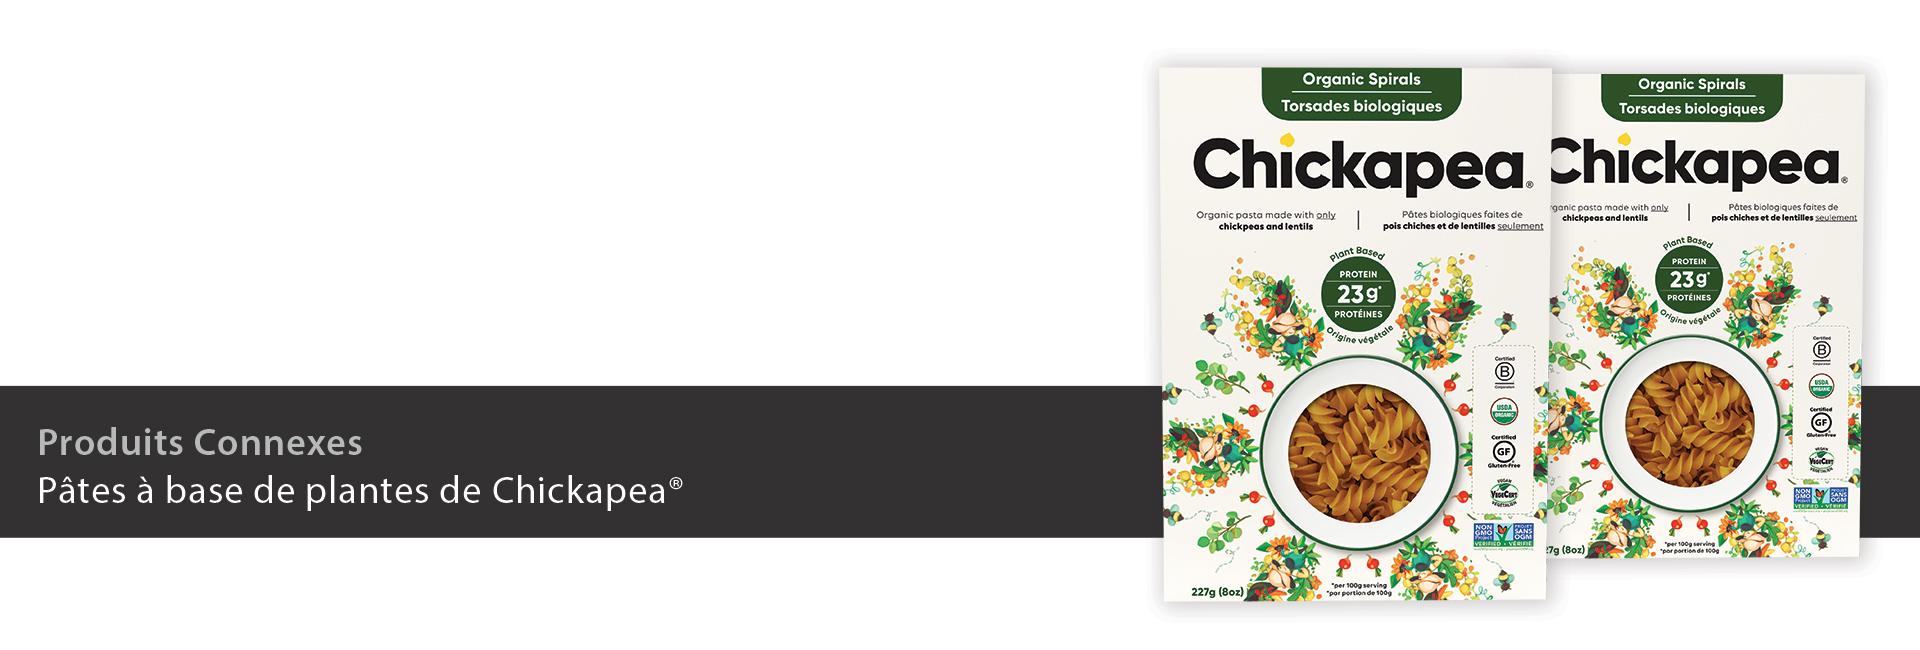 Pâtes à base de plantes de Chickapea